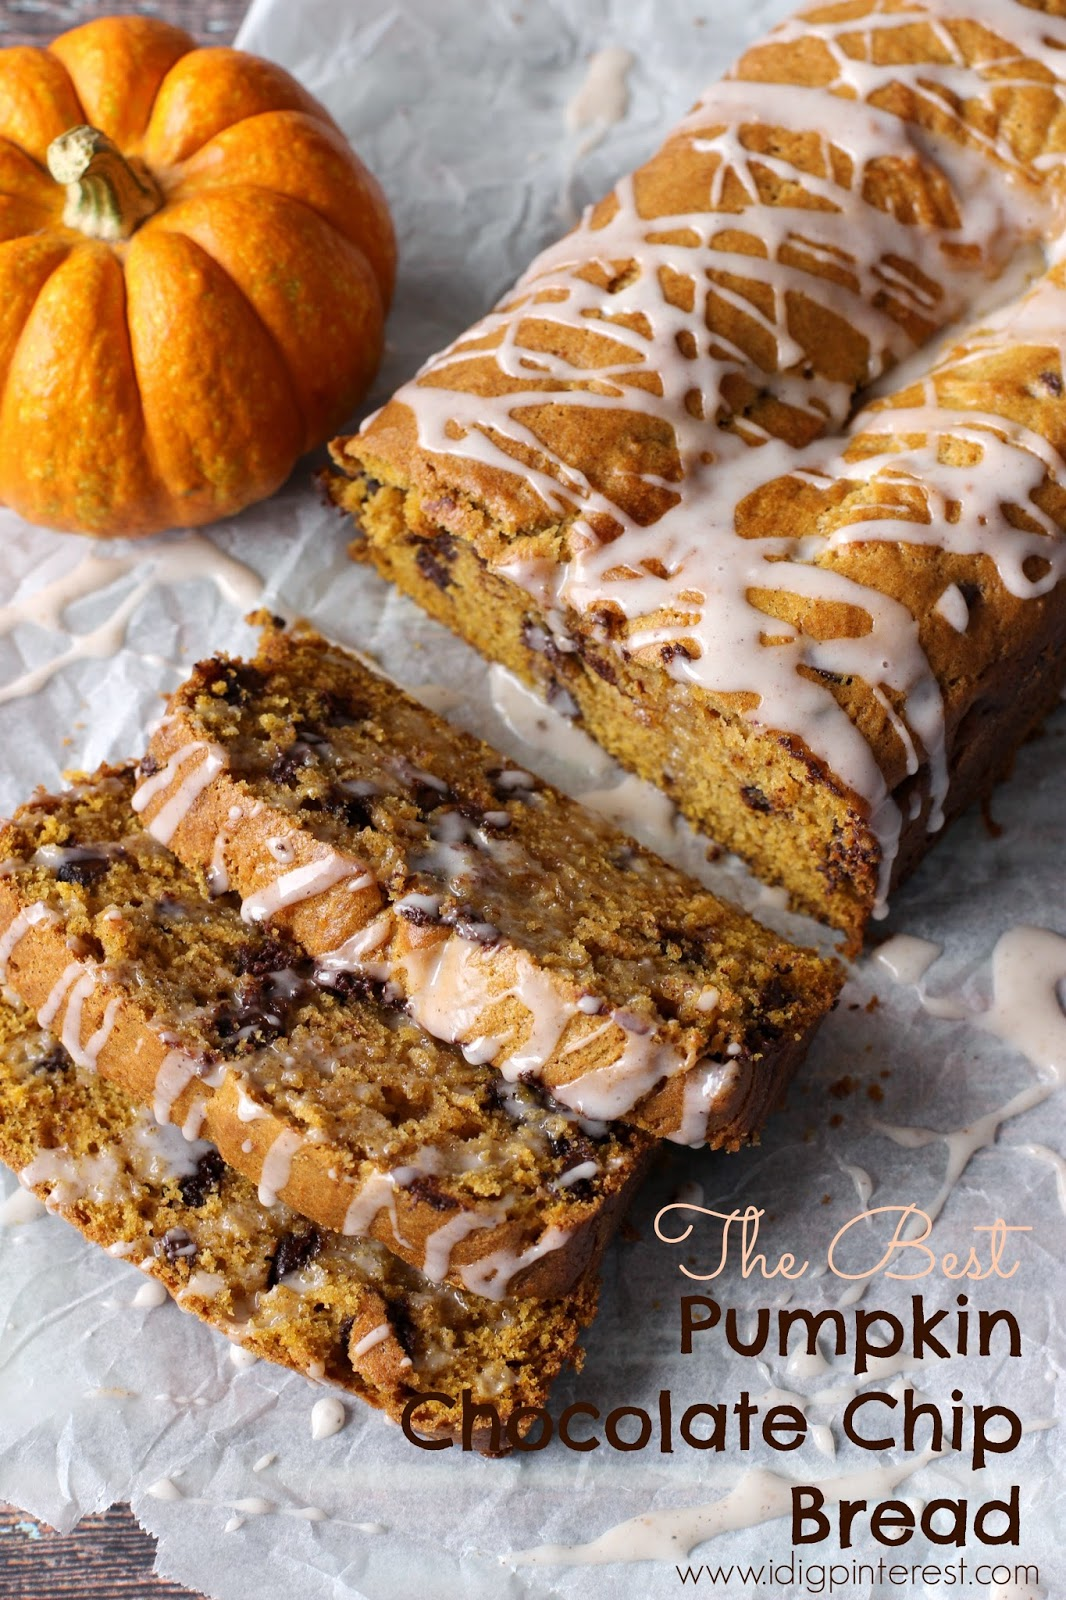 The Best Pumpkin Chocolate Chip Bread - I Dig Pinterest